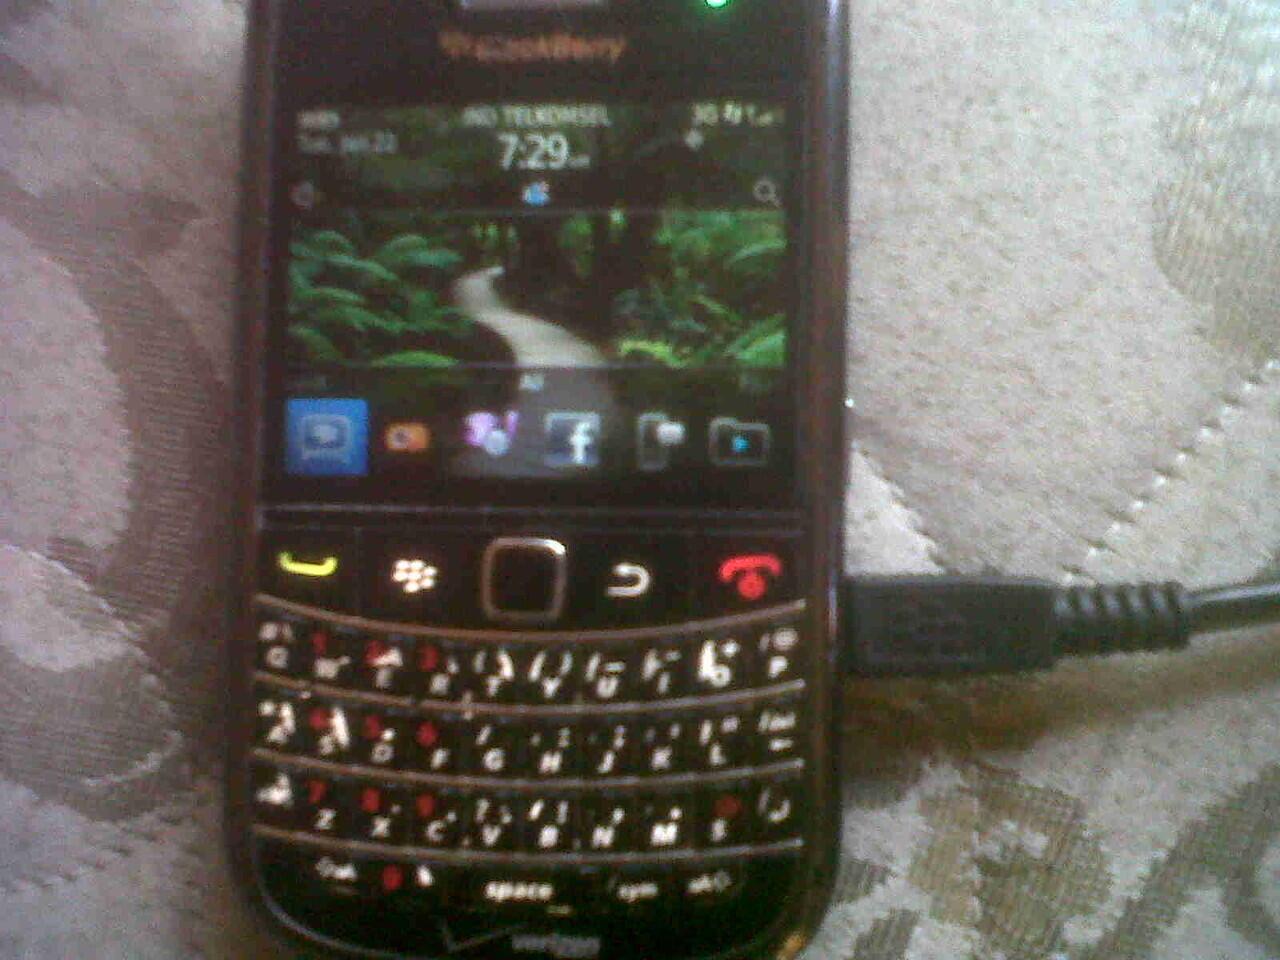 Blackberry / BB Esex 9650